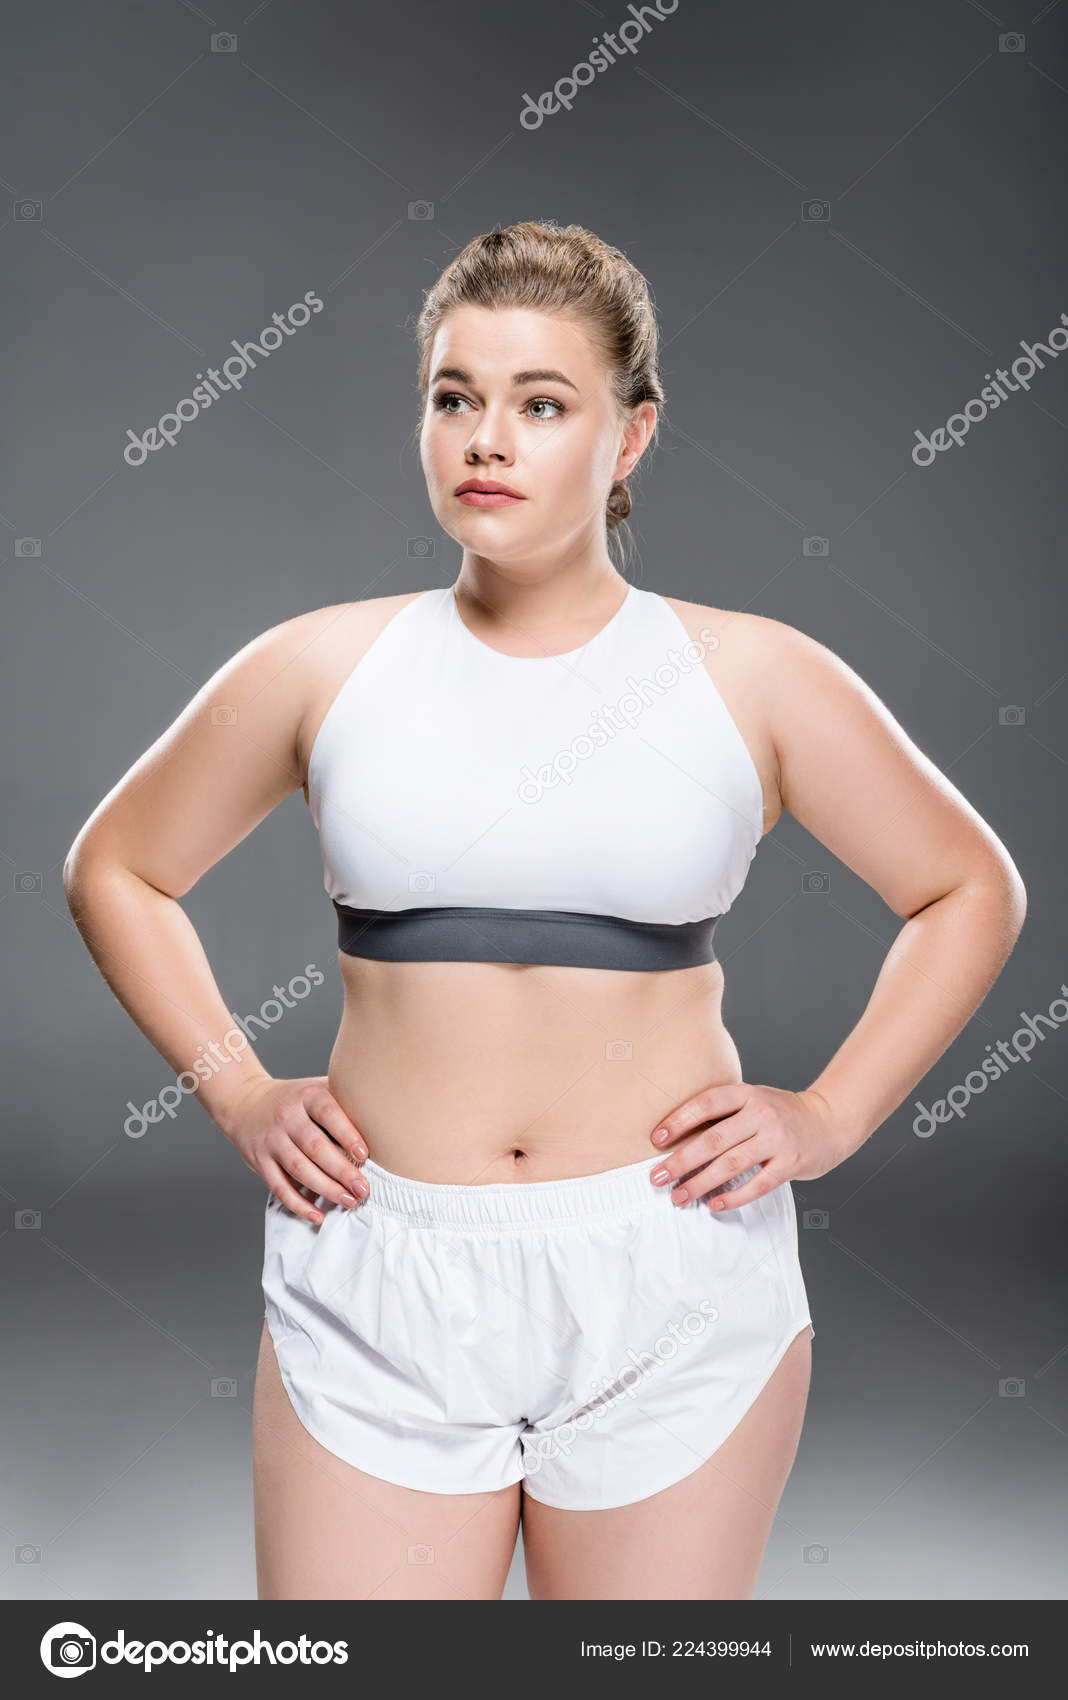 57b42d7d59b5 Ελκυστική Νεαρή Γυναίκα Υπερμεγέθη Αθλητικά Είδη Στέκεται Χέρια Στη Μέση — Φωτογραφία  Αρχείου